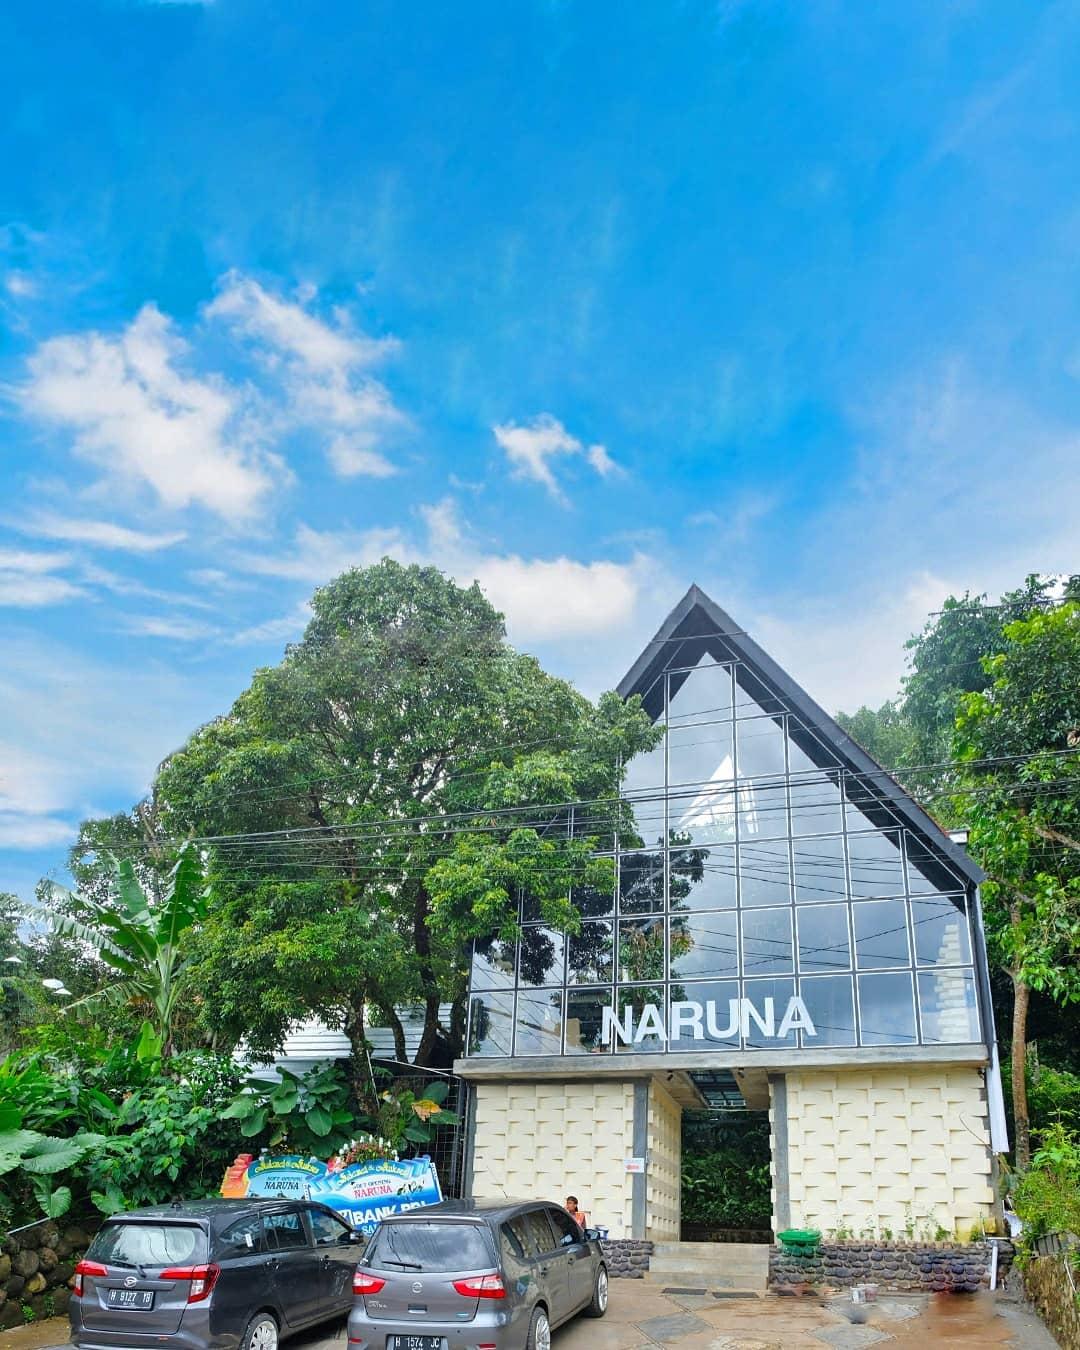 Naruna Creative Space Salatiga   Promotion Your Event in Here